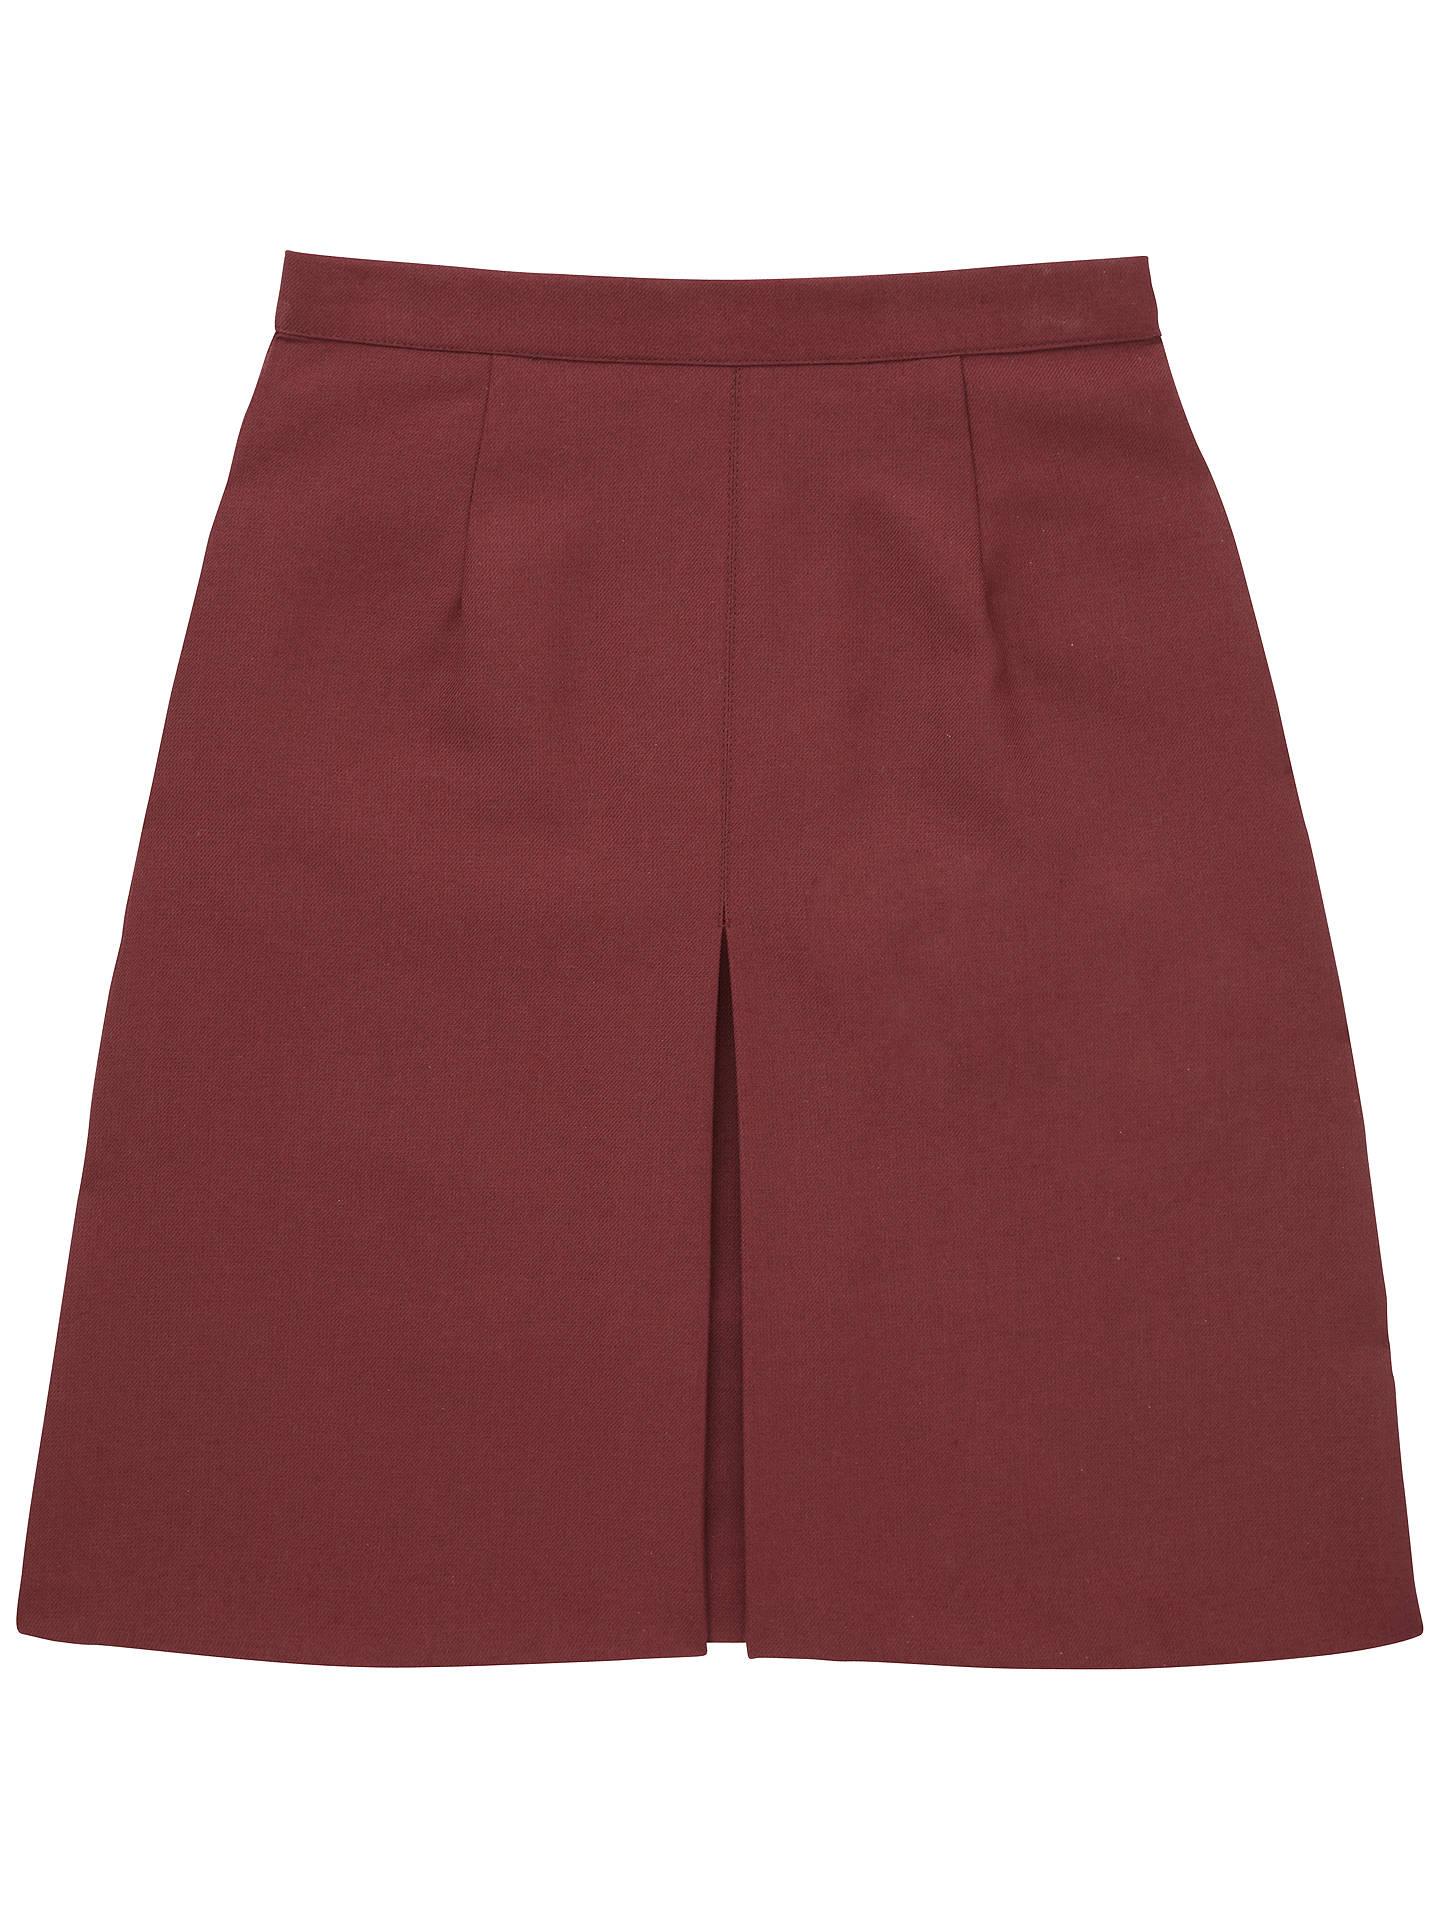 84cefe8ae Girls' School Inverted Pleat Skirt, Maroon at John Lewis & Partners